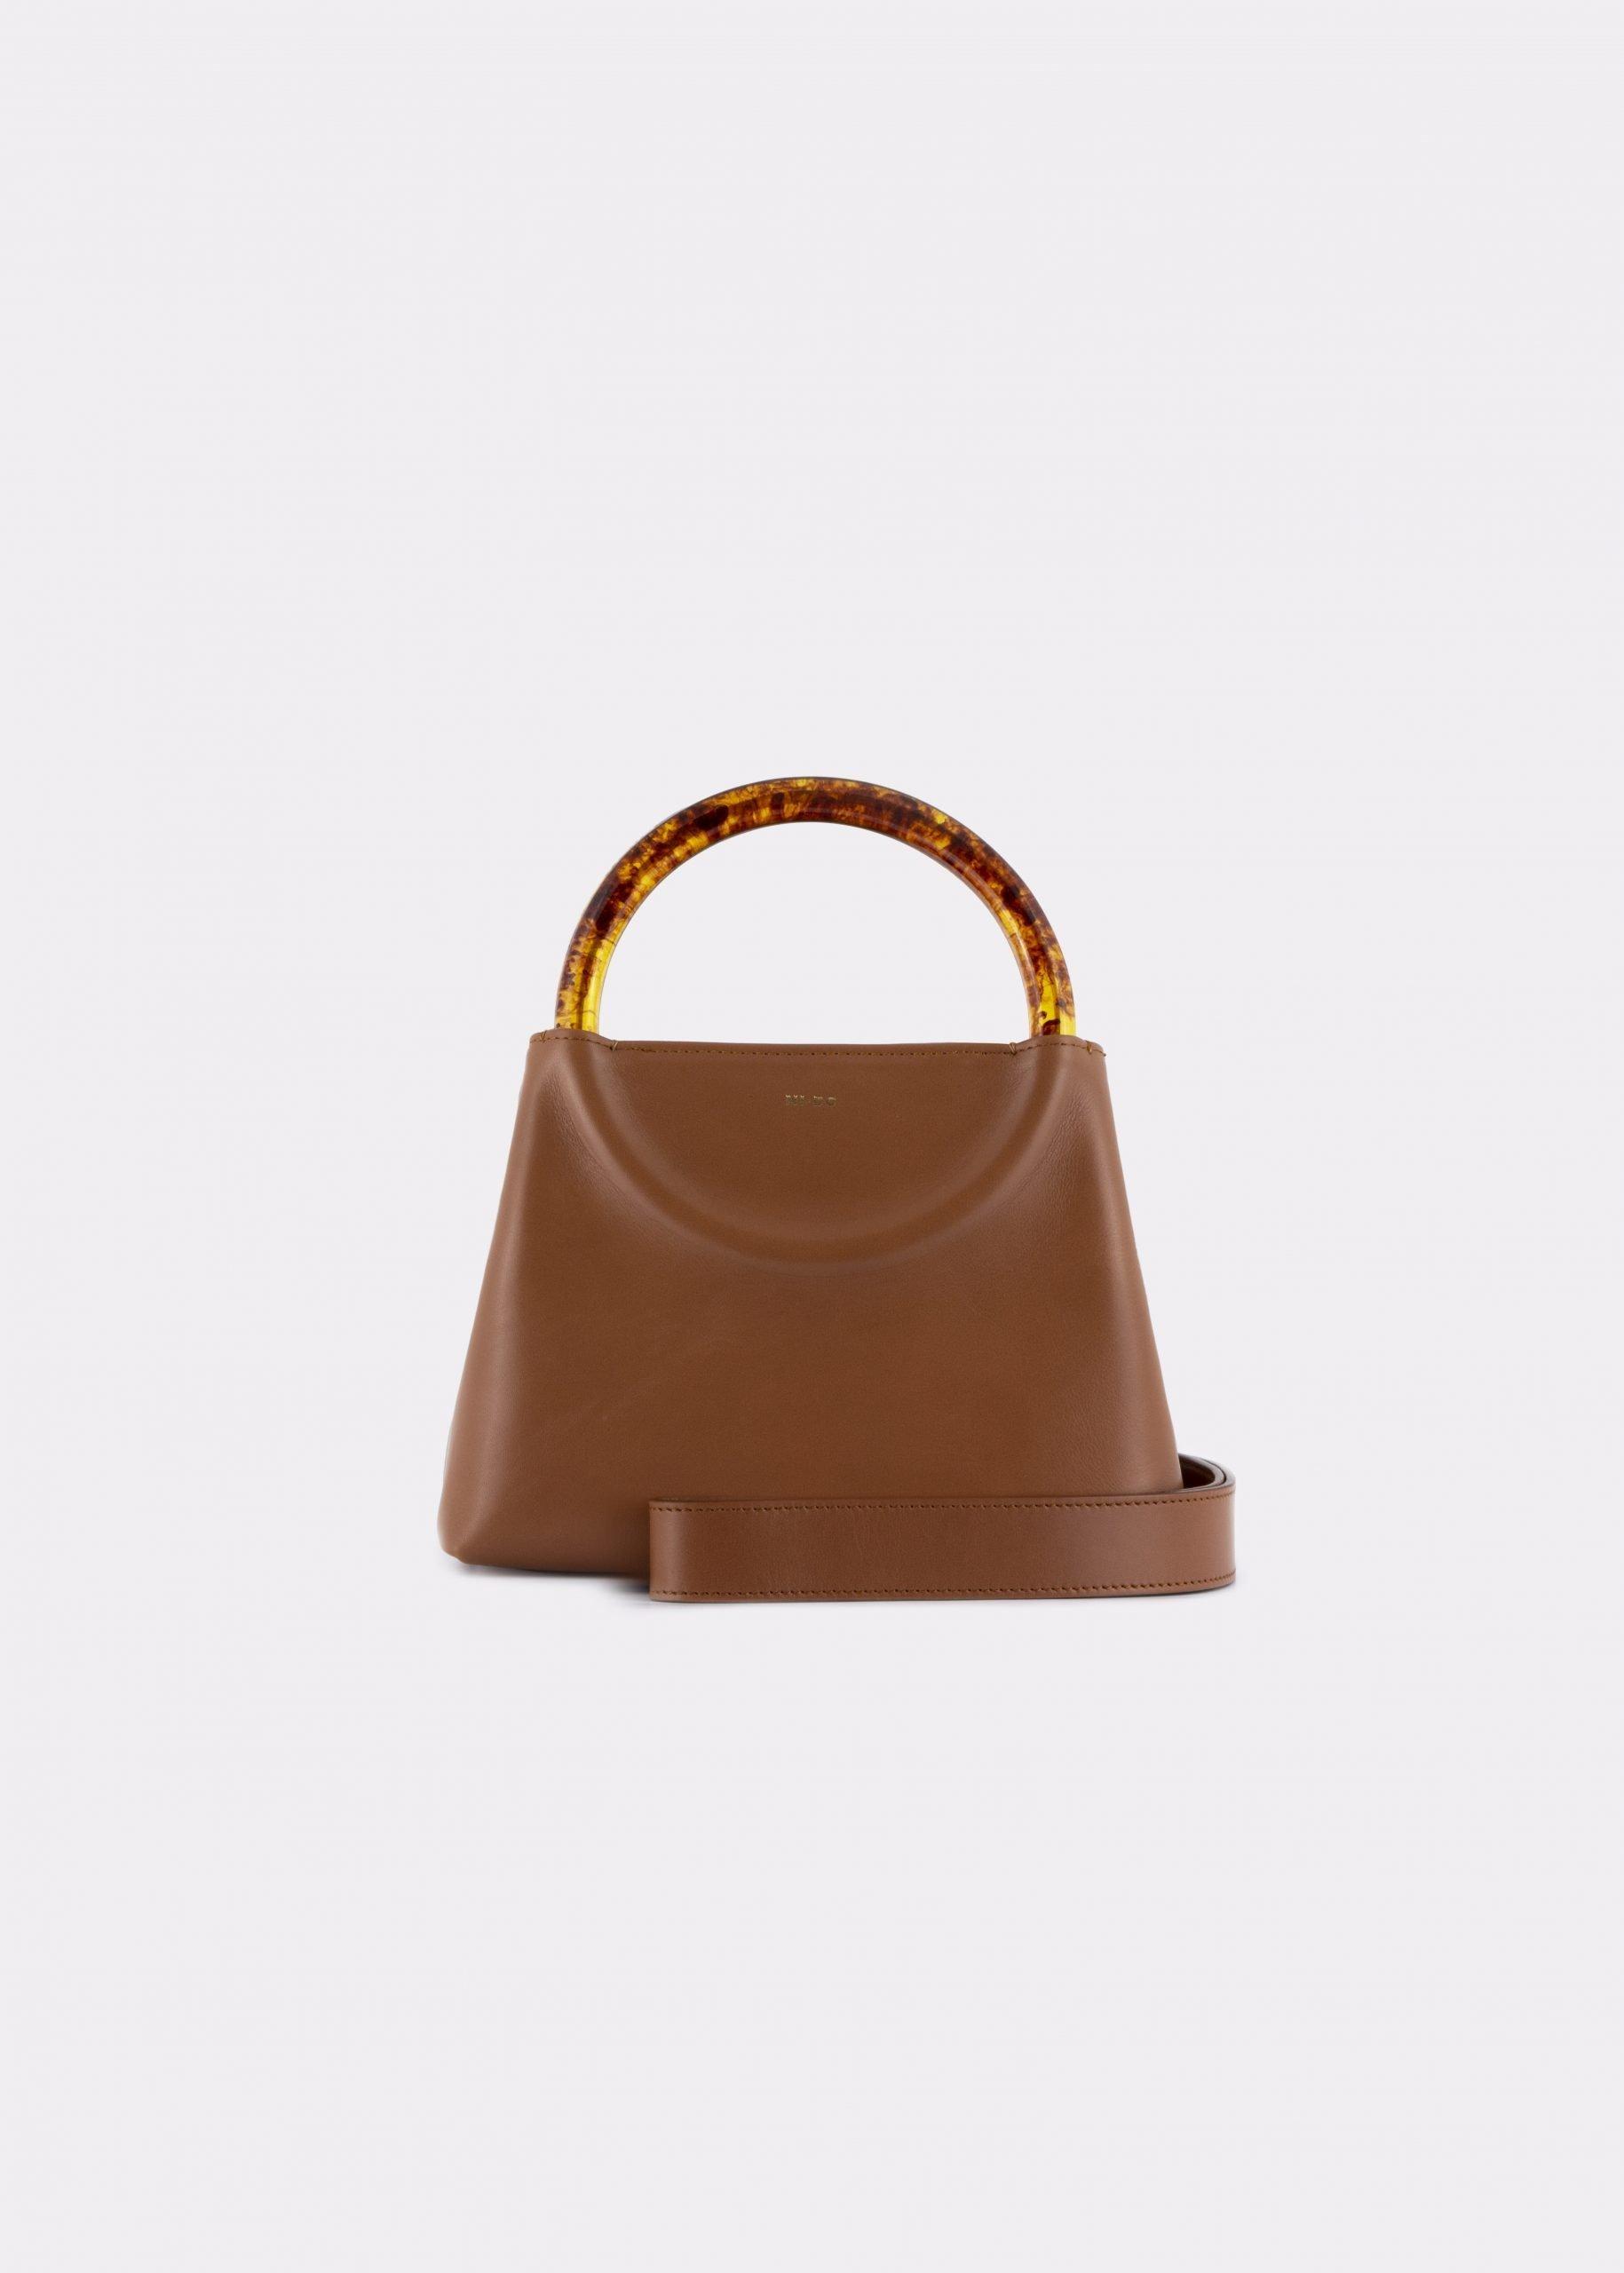 NIDO Bolla Mini Biscuit/Amber_ shoulder strap view